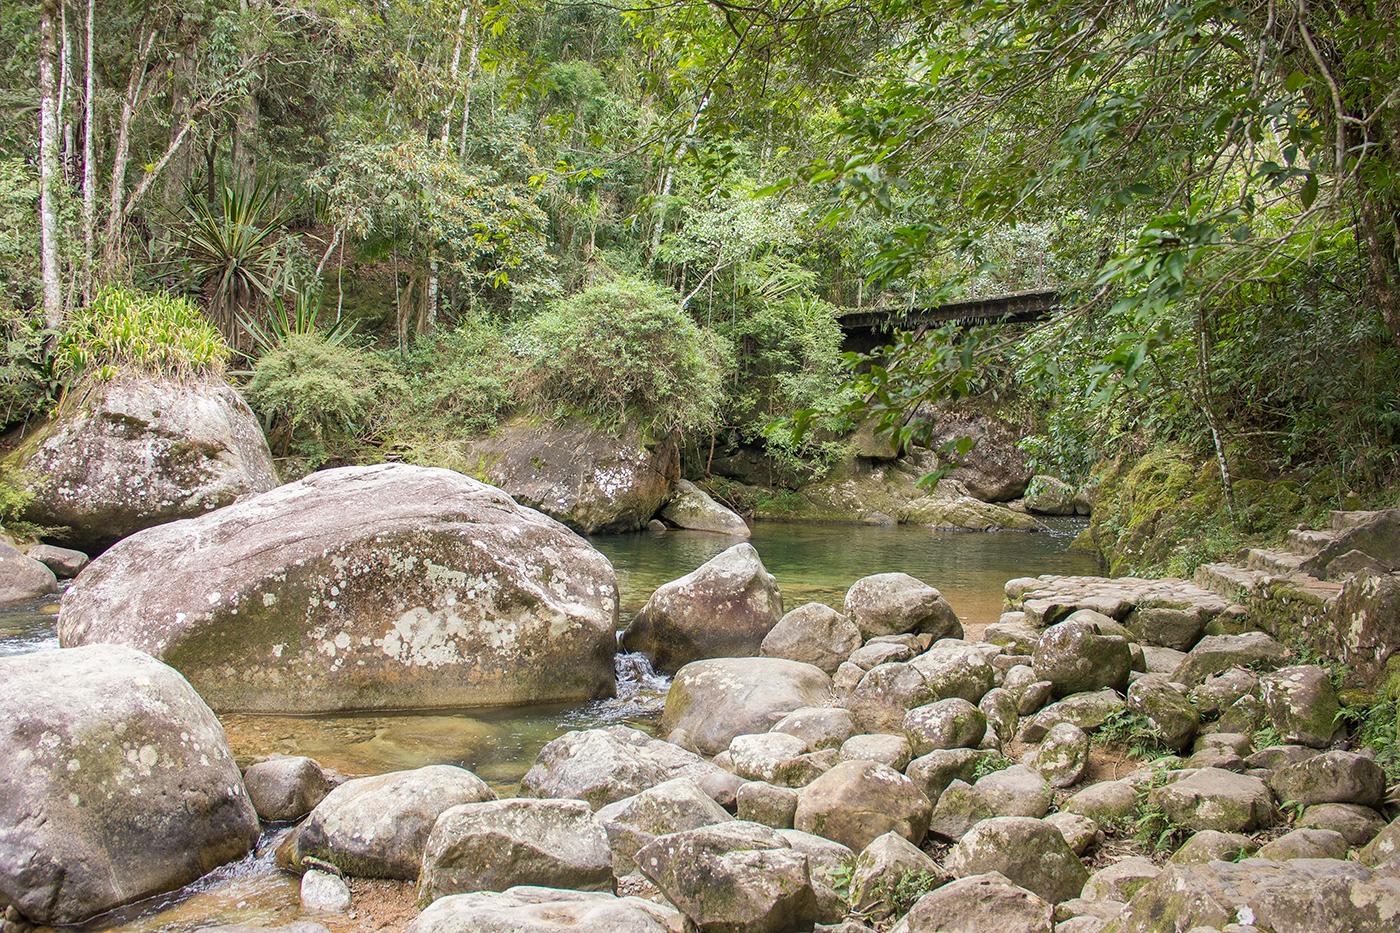 Parque Nacional do Itatiaia (Foto: Adobe Stock)